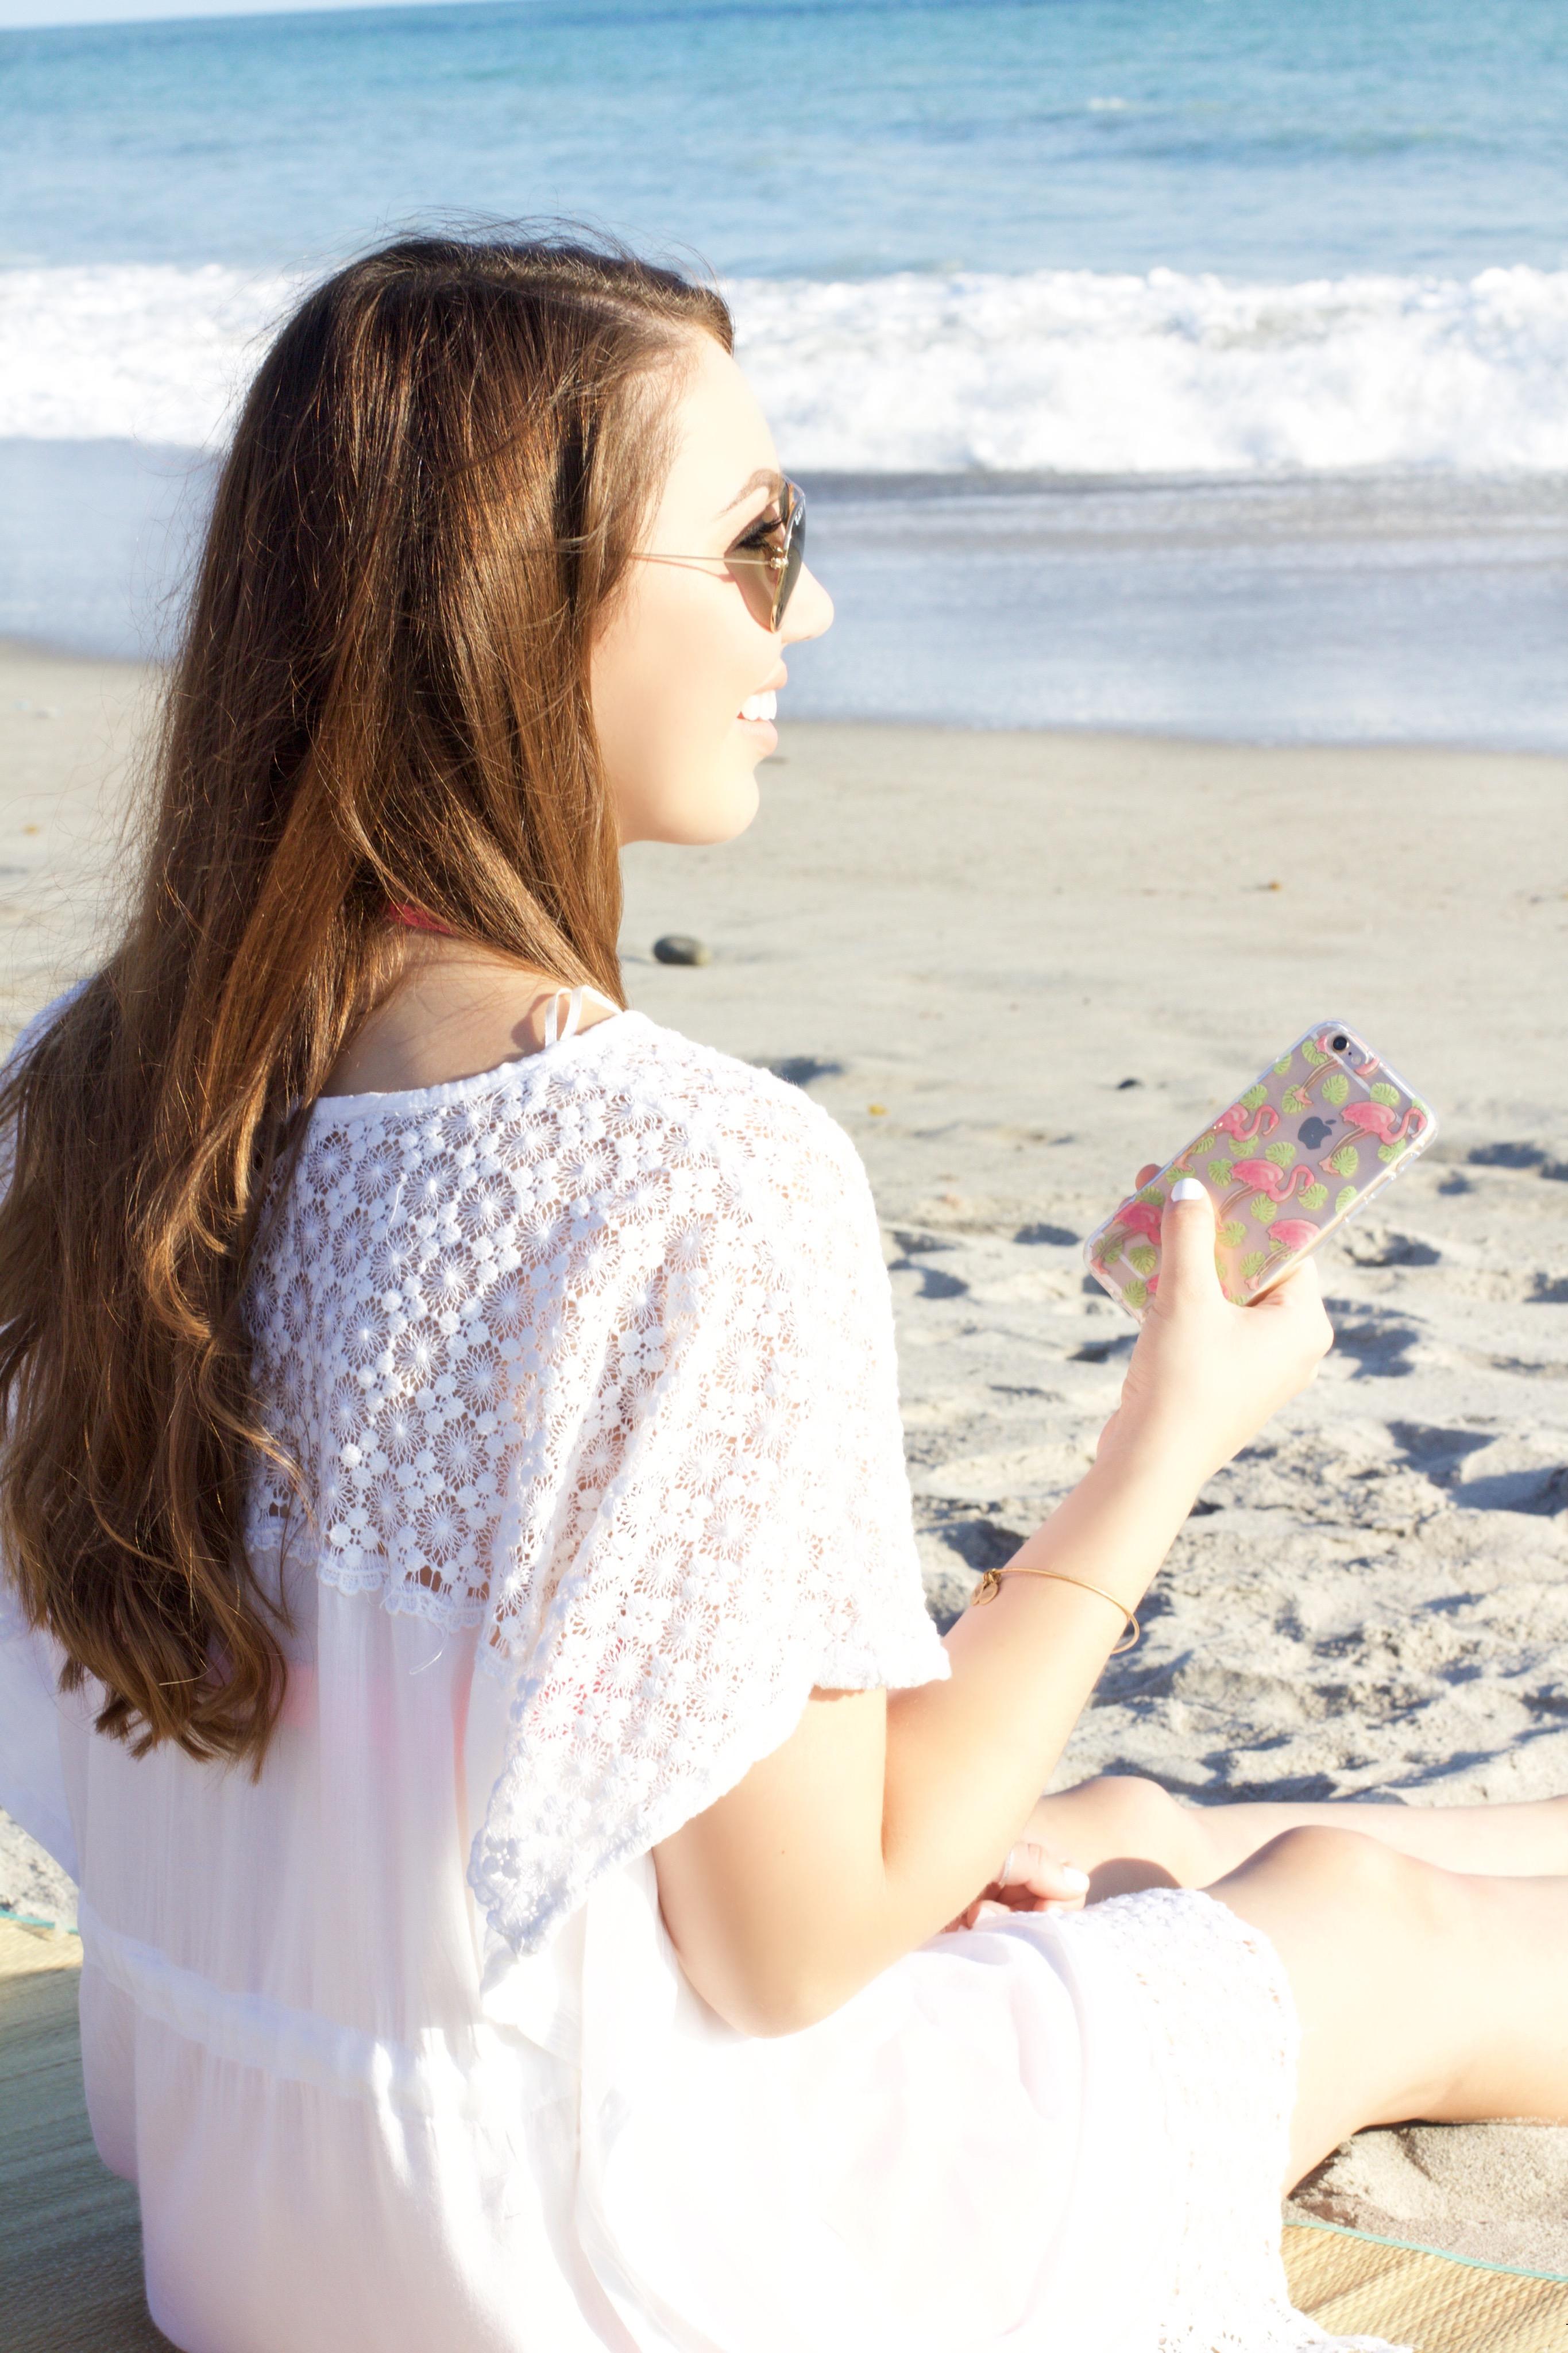 bd3611045298 Incipio Flamingo iPhone case - my styled life